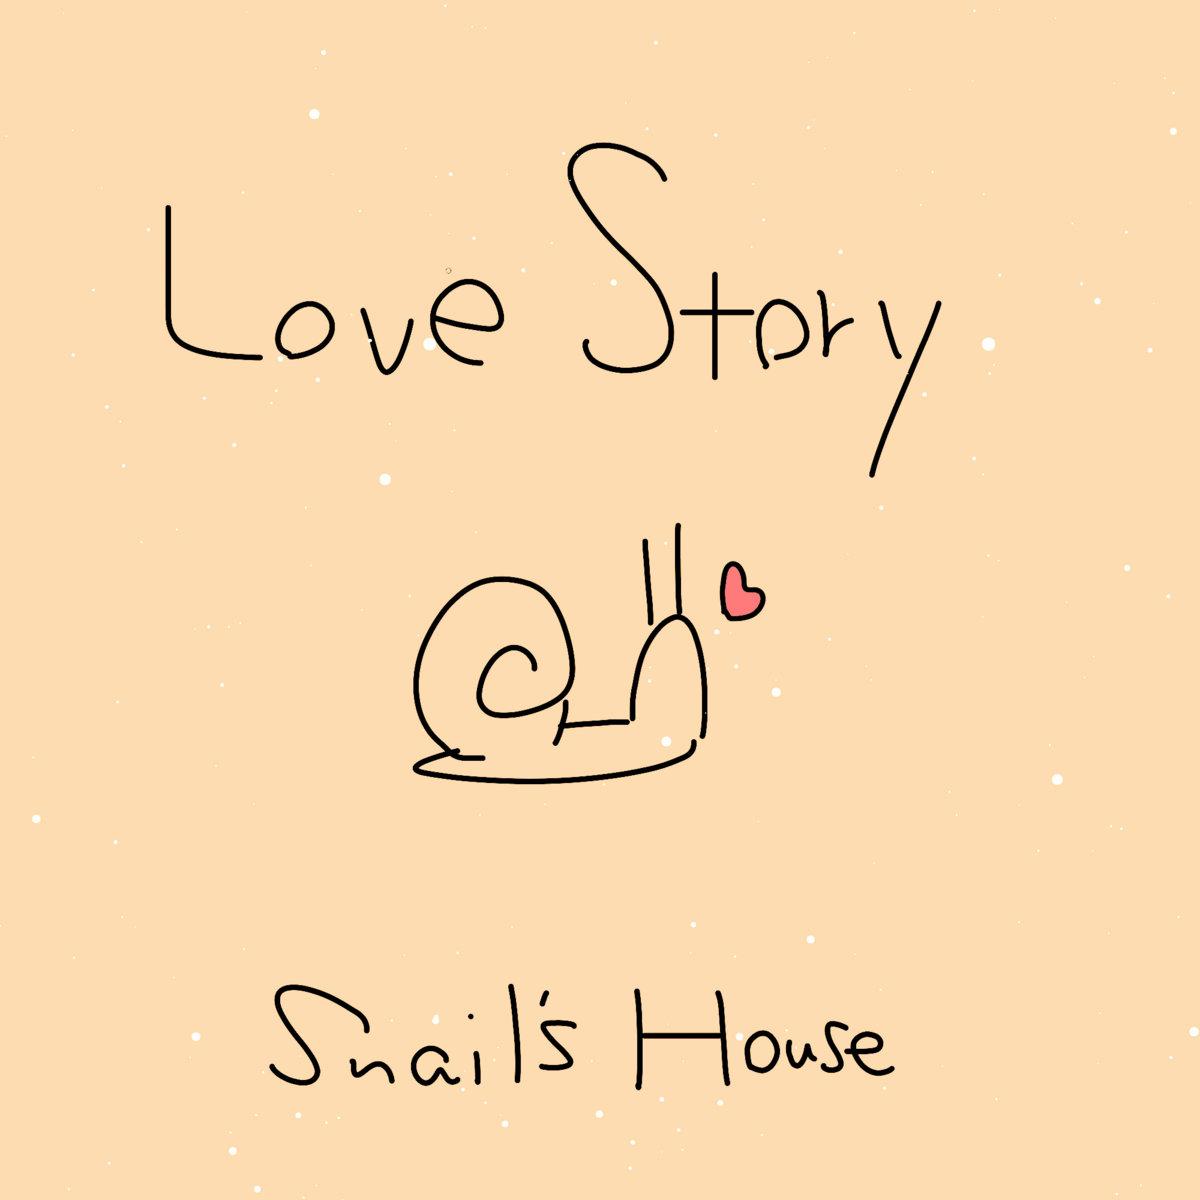 Love story ujico snail 39 s house for House music tracks